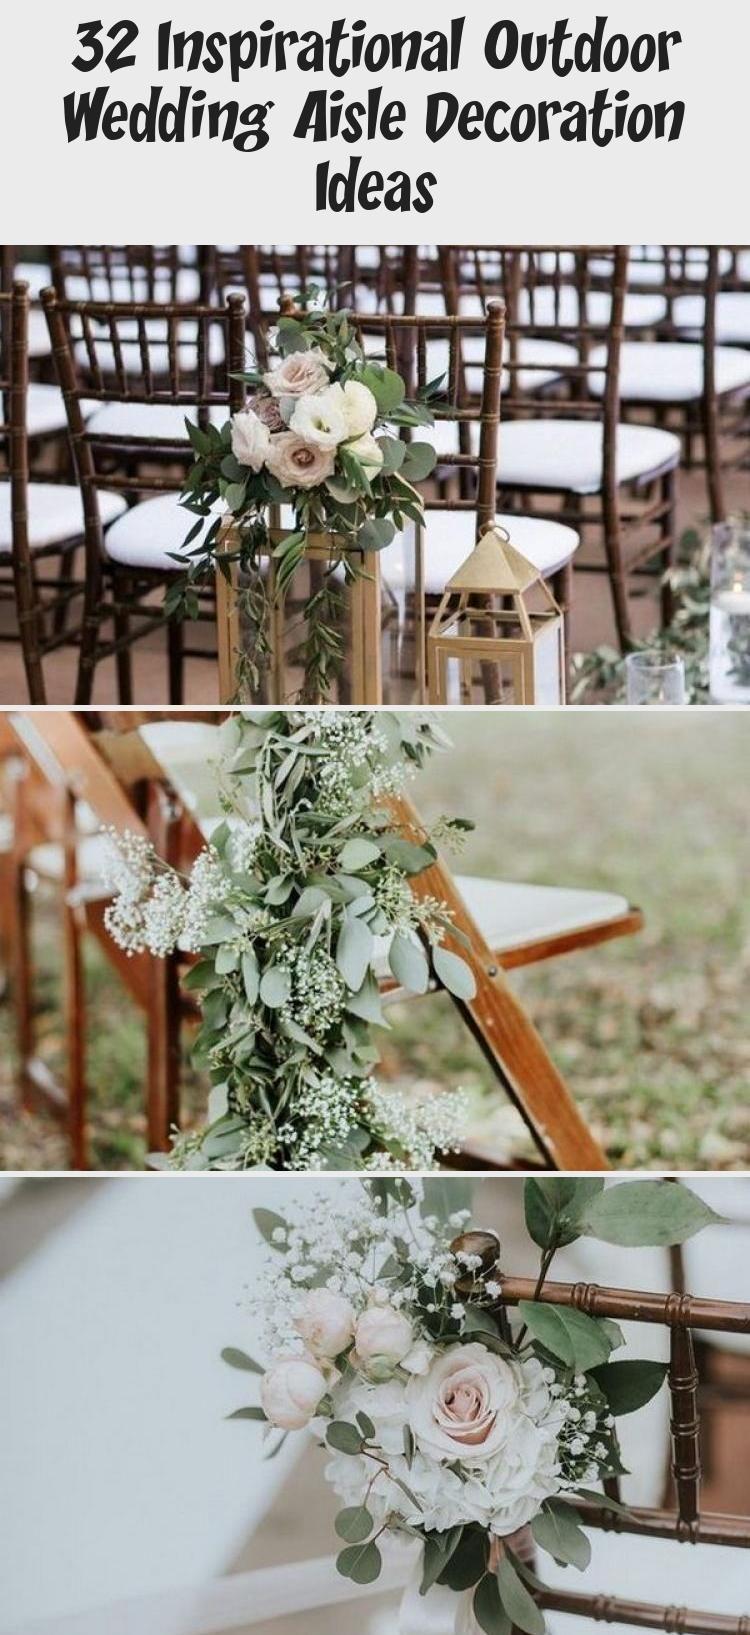 32 Inspirational Outdoor Wedding Aisle Decoration Ideas ...